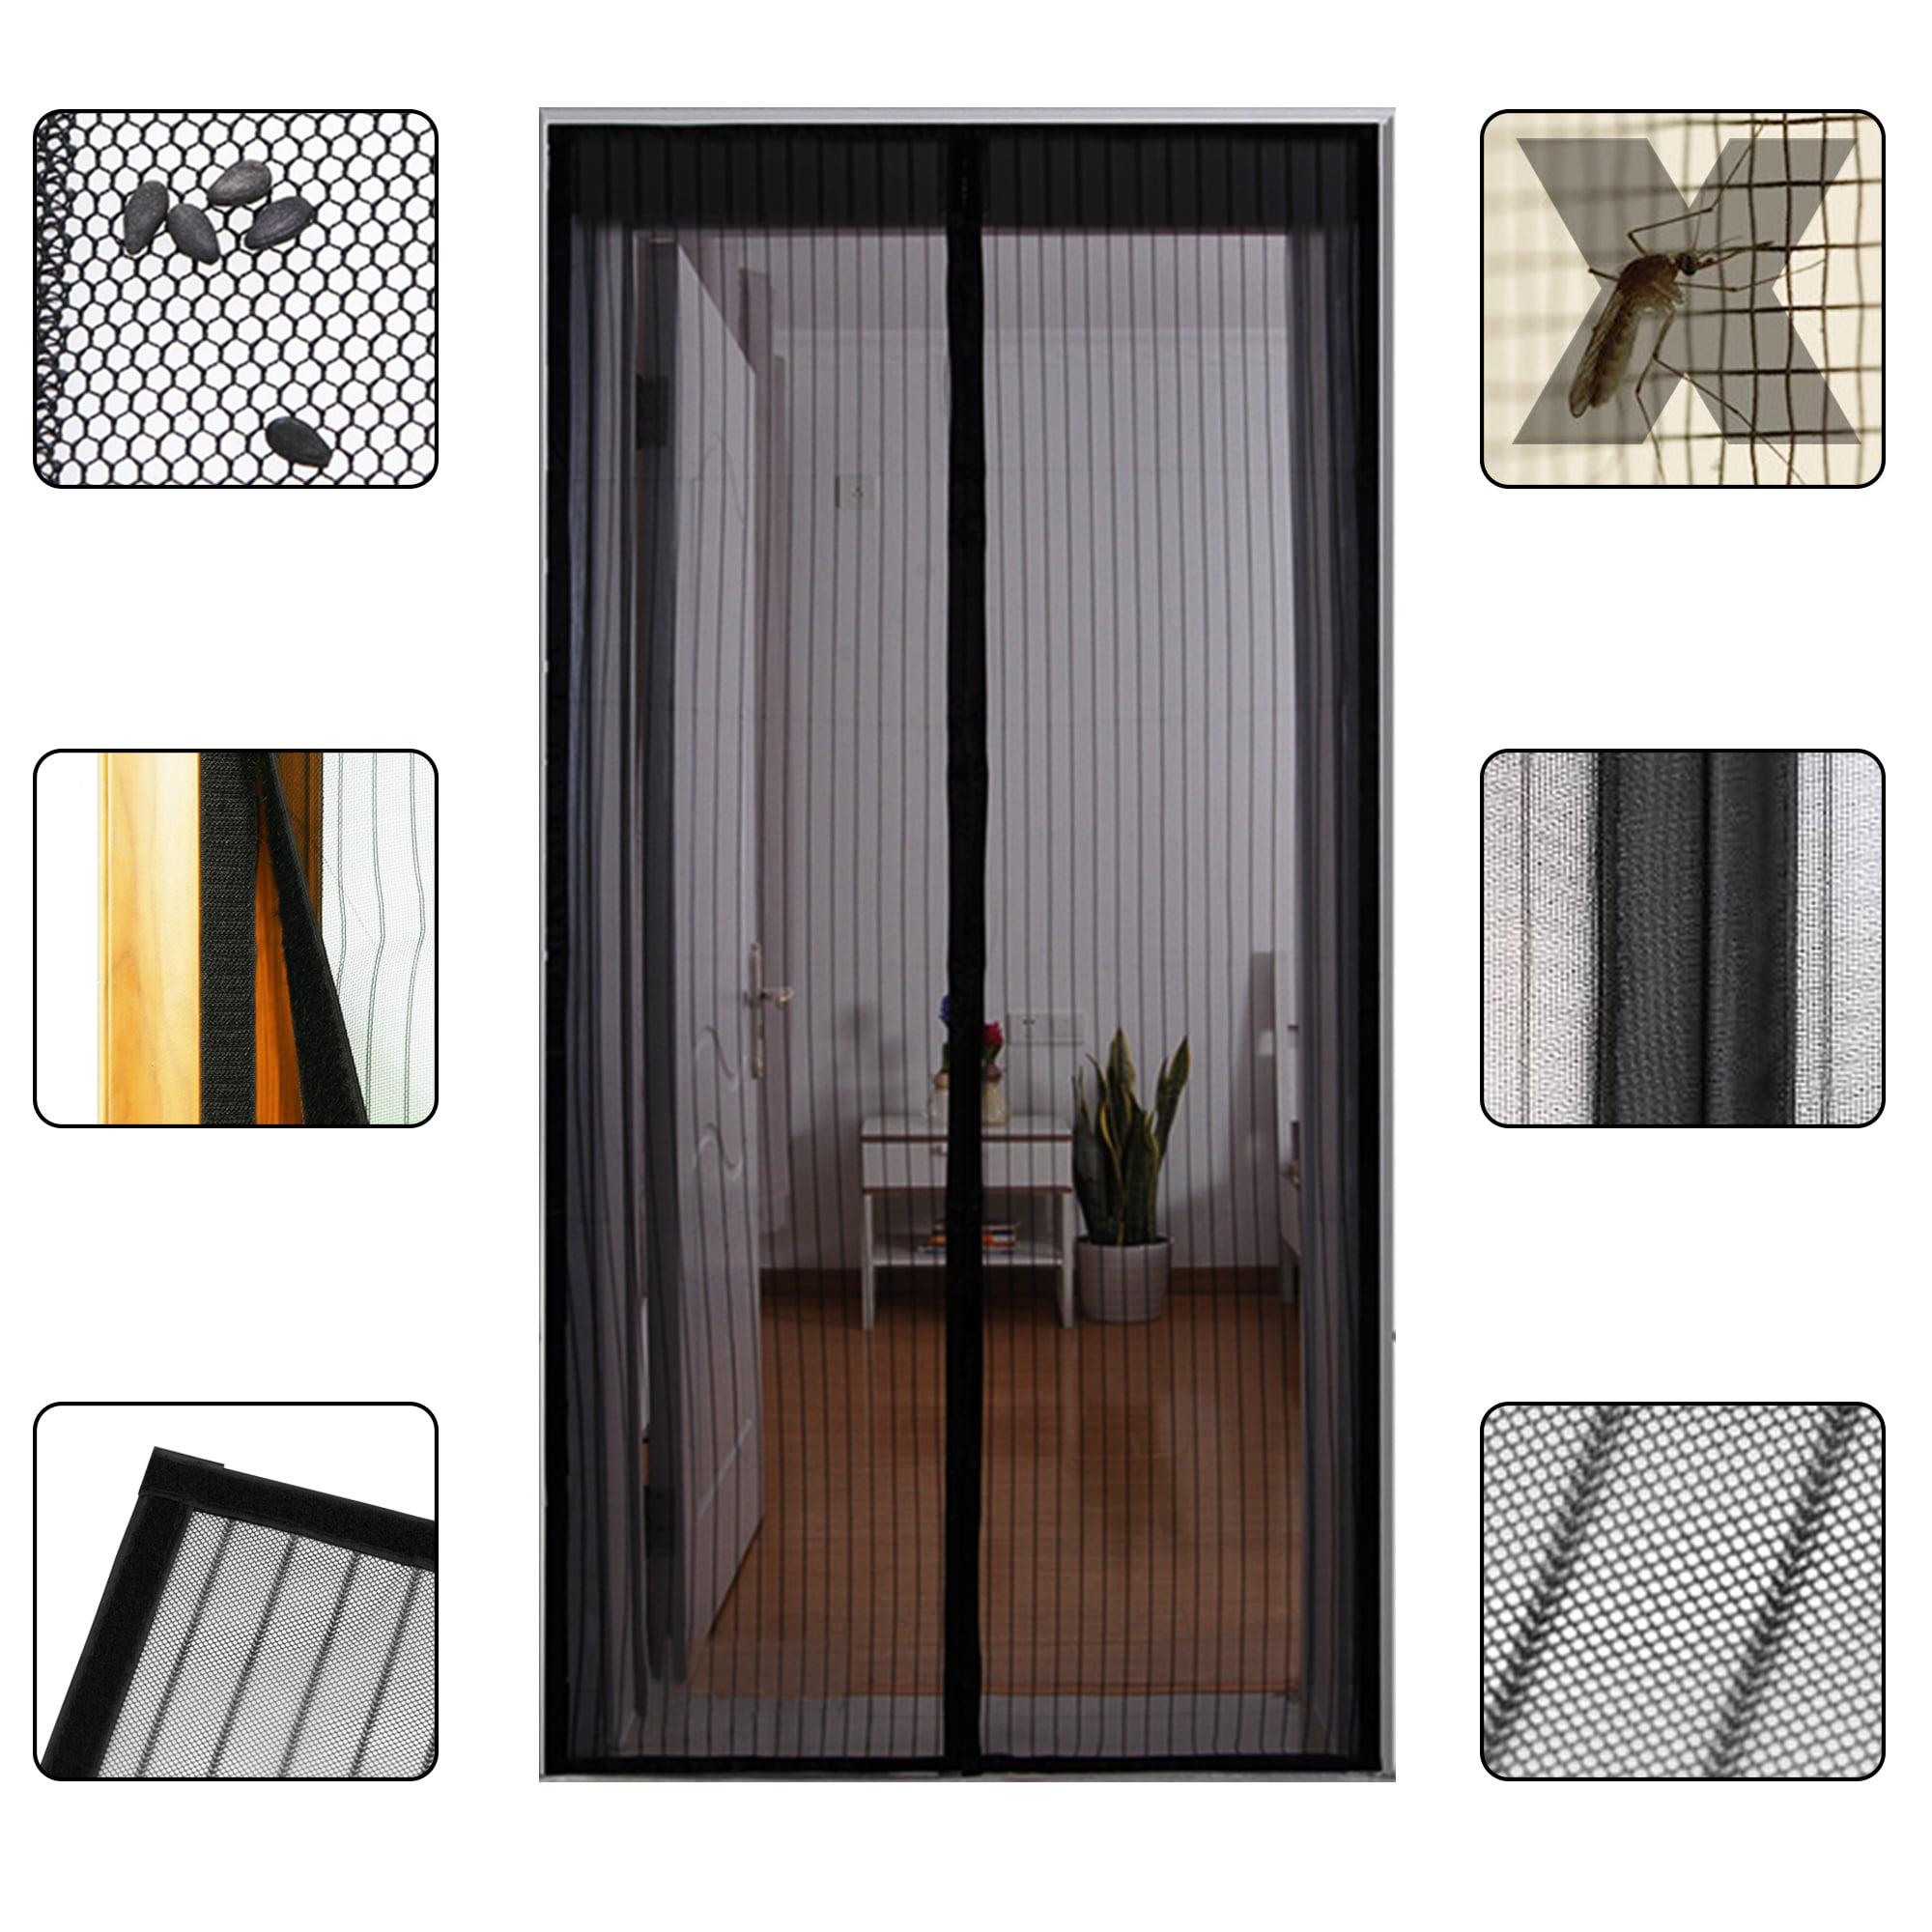 Hoobest Magnetic Screen Door-Heavy Duty Mesh /& Full Frame Velcro Fits Doors Openings Up to 34x82 S-White